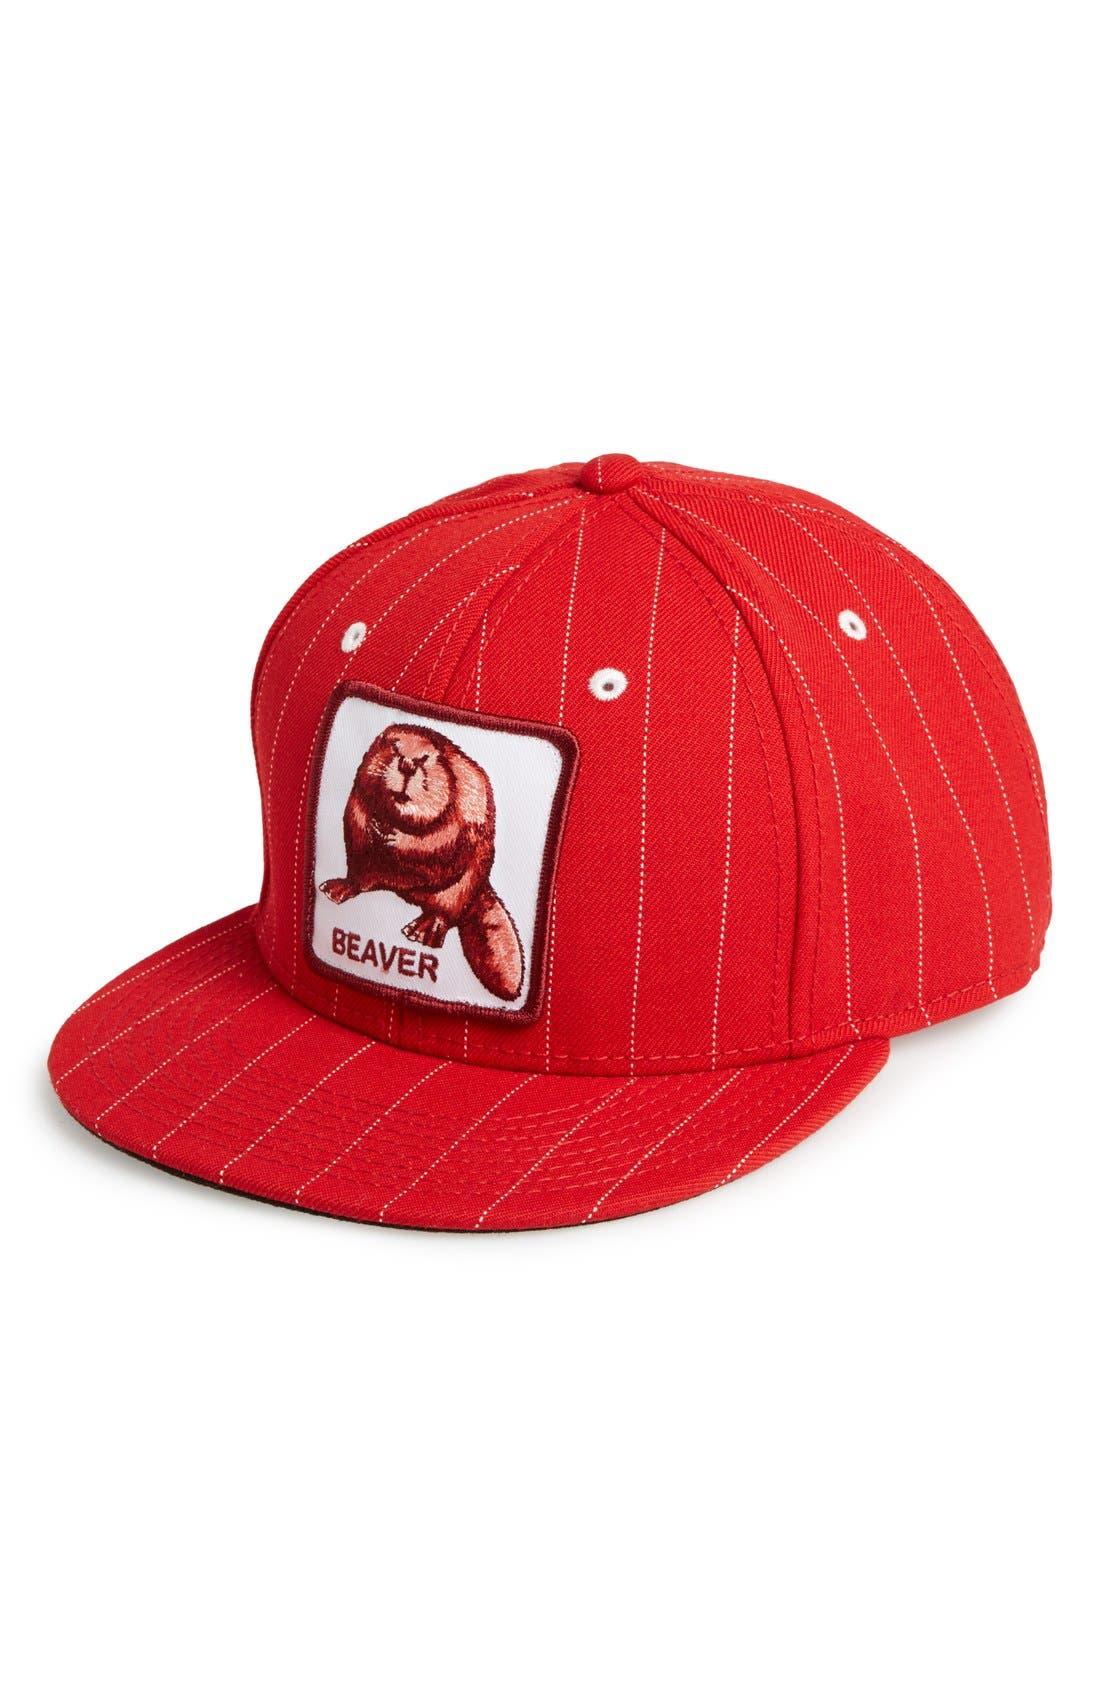 Alternate Image 1 Selected - Goorin Brothers 'Beaver Dam' Baseball Cap